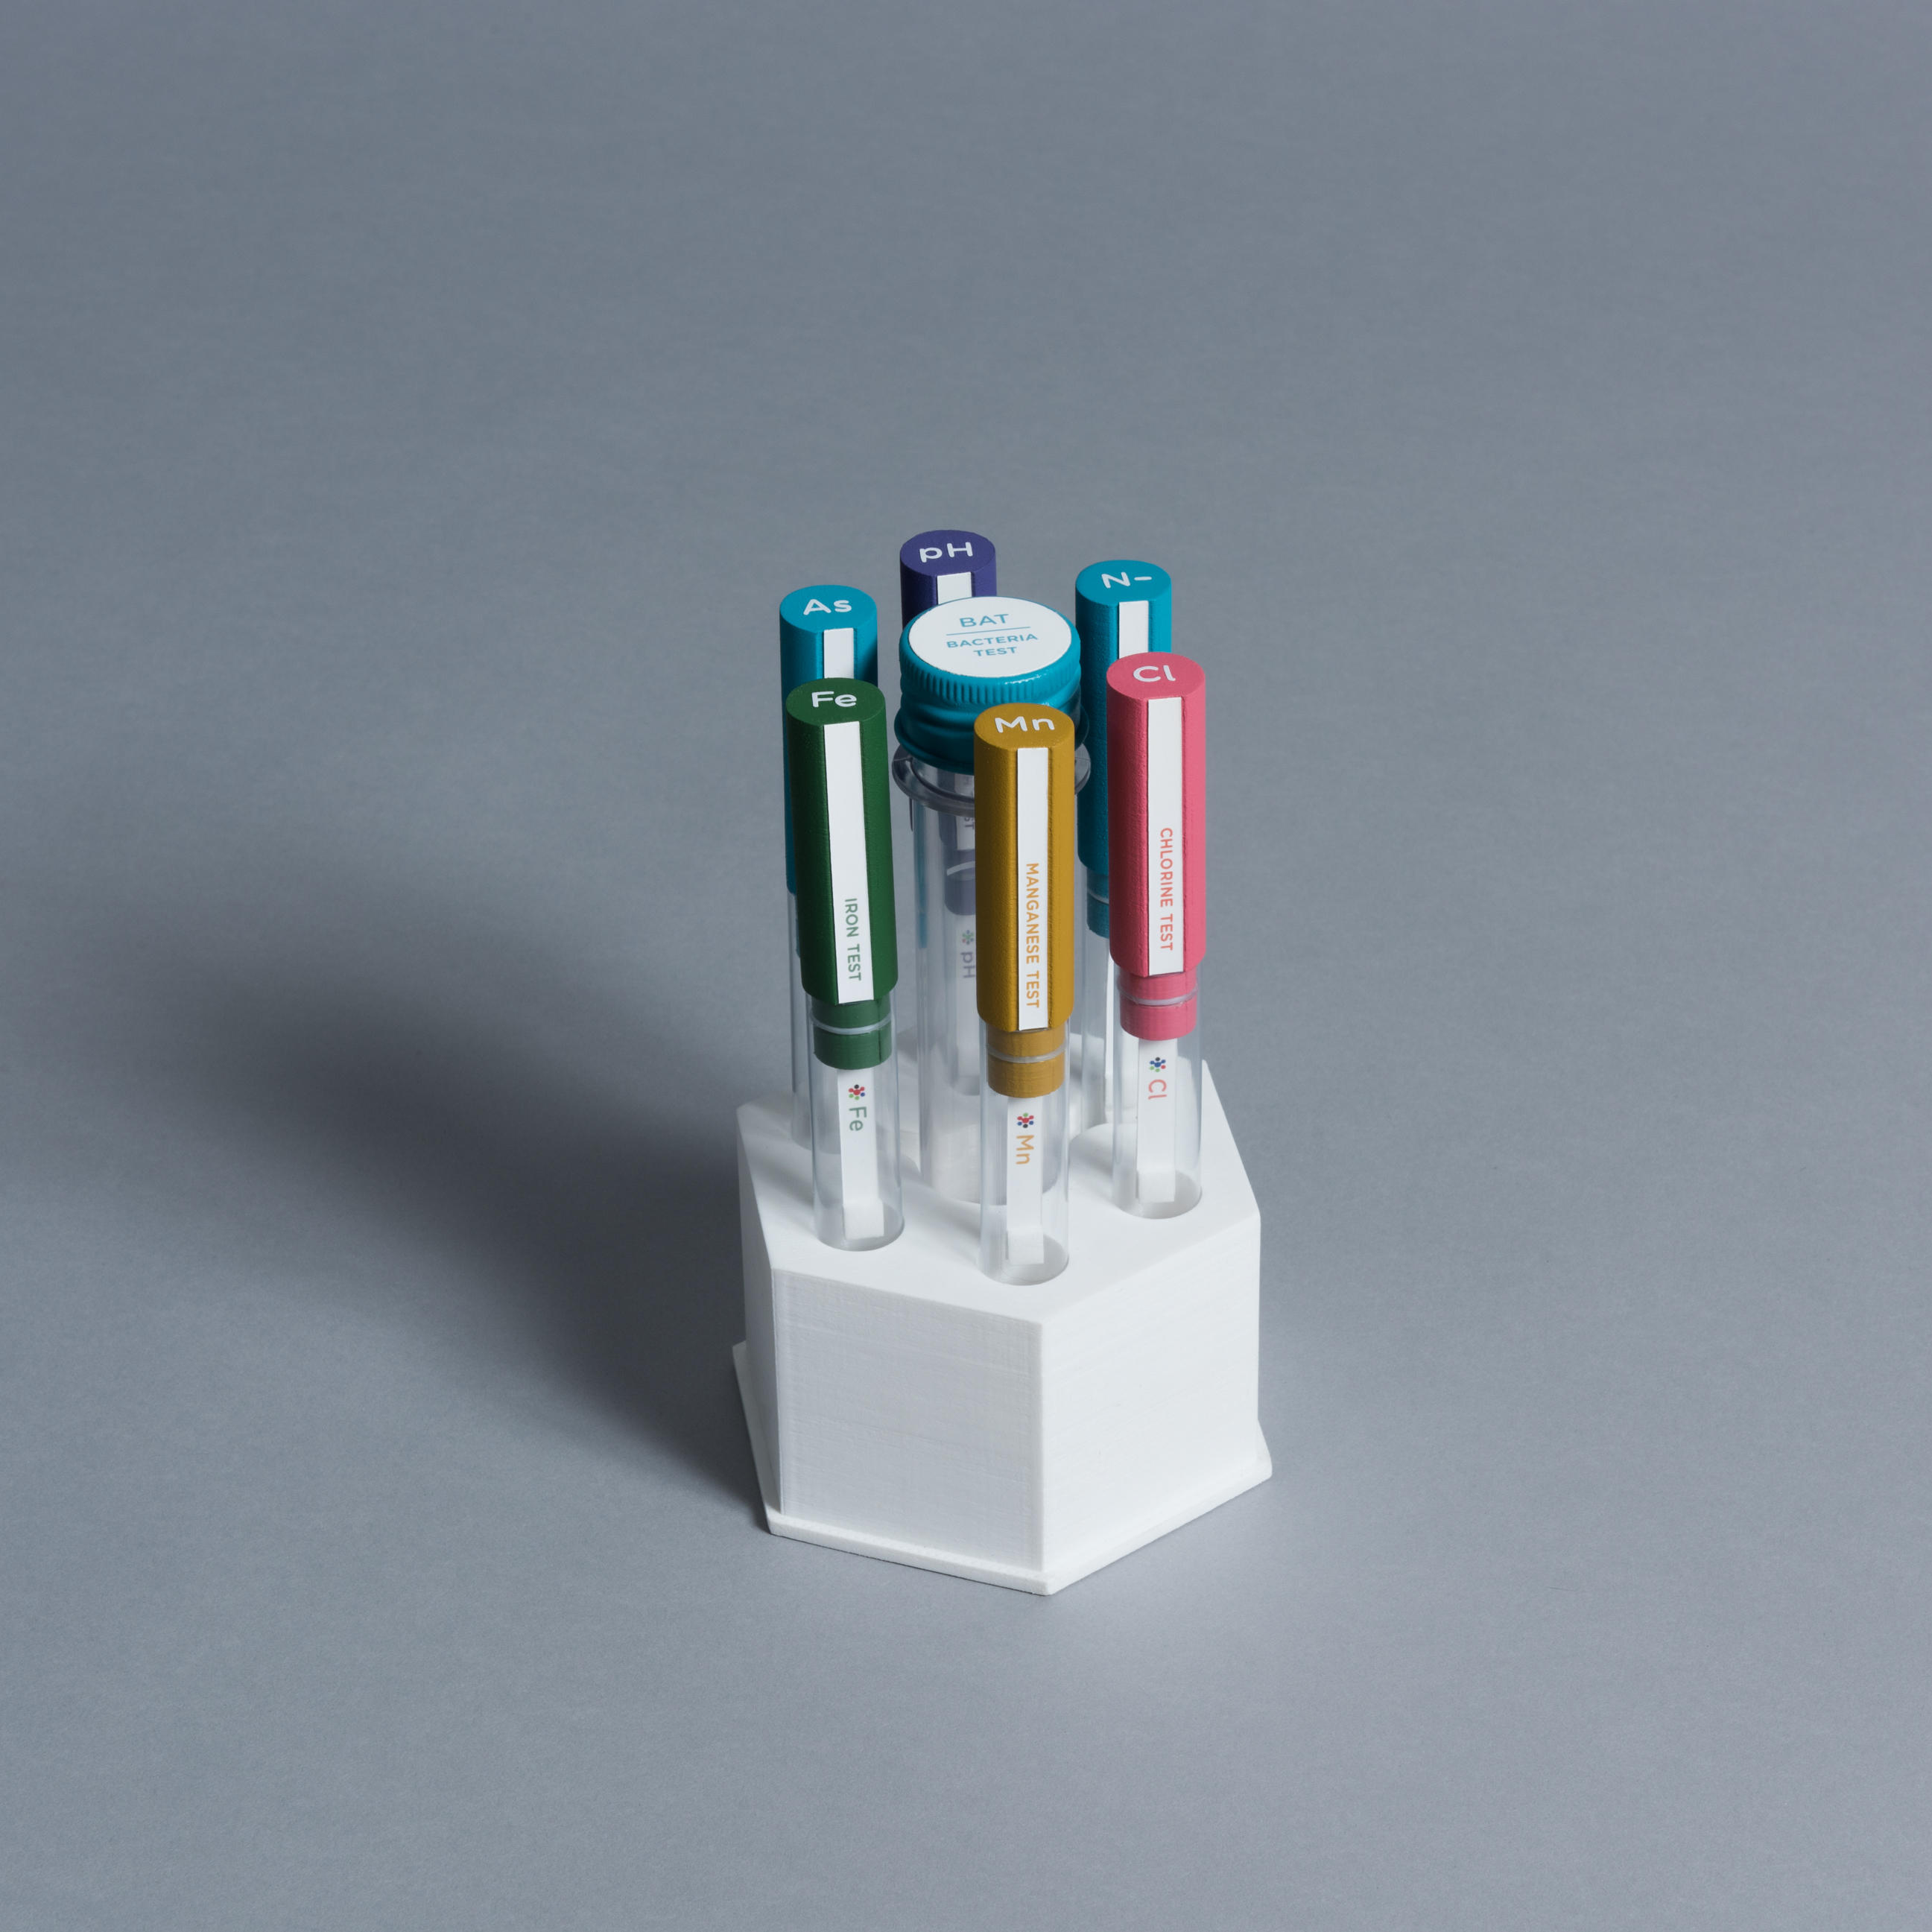 test tubes inside a hexagonal package